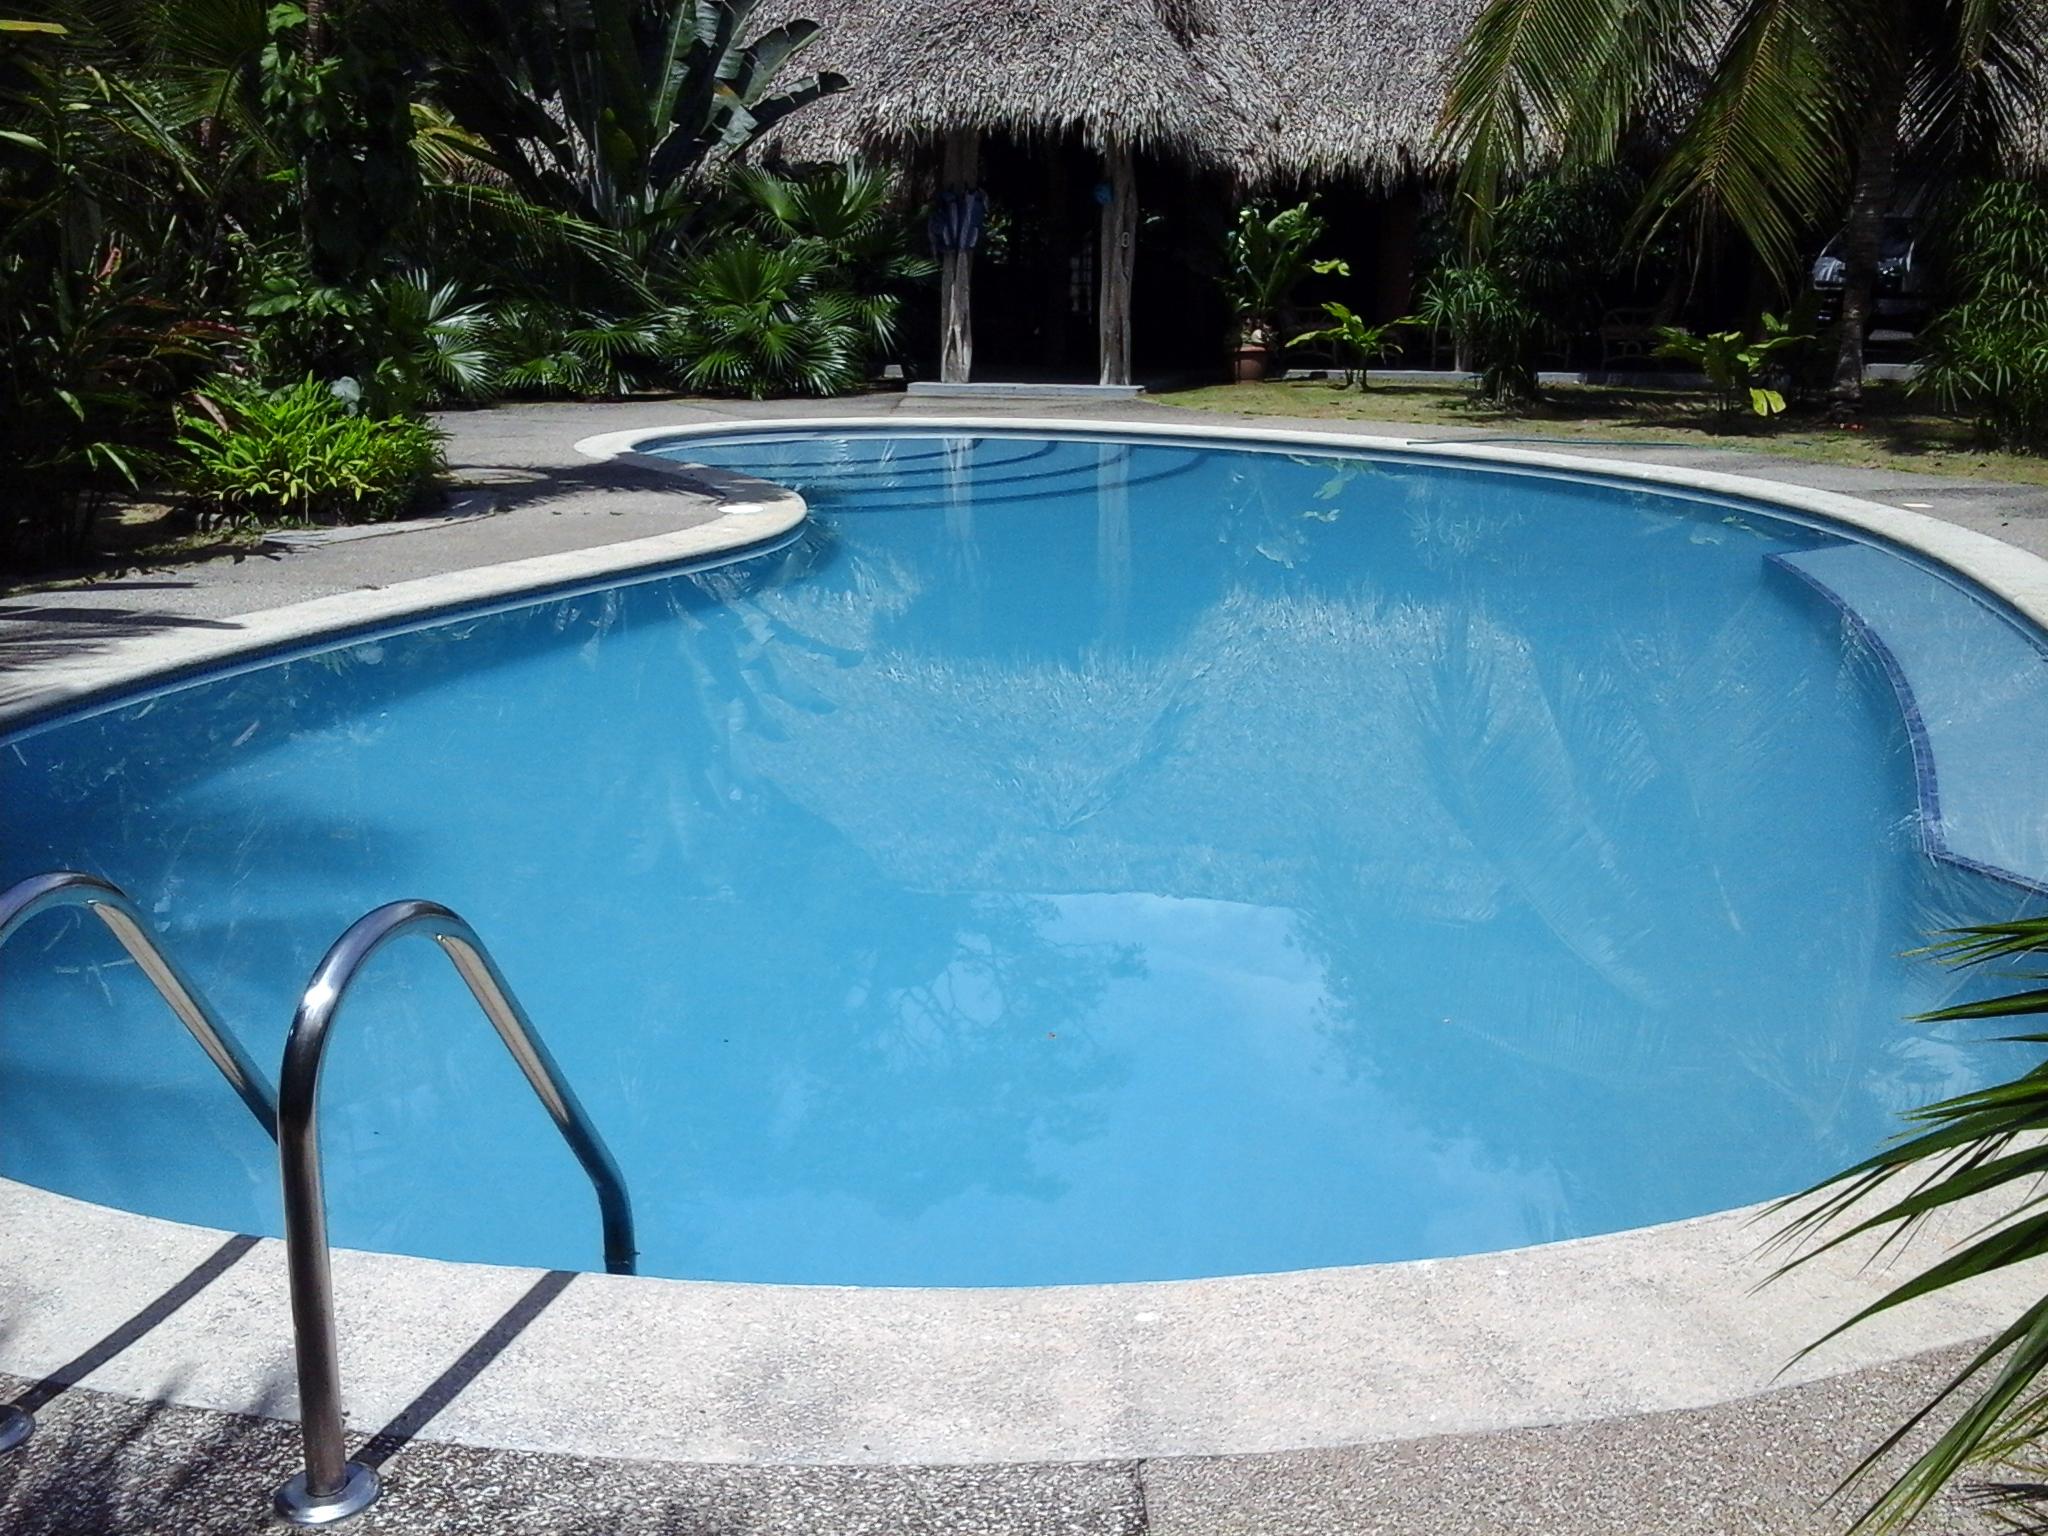 Est s pensando en comprar una piscina piscinas costa for Piscinas de fibra costa rica